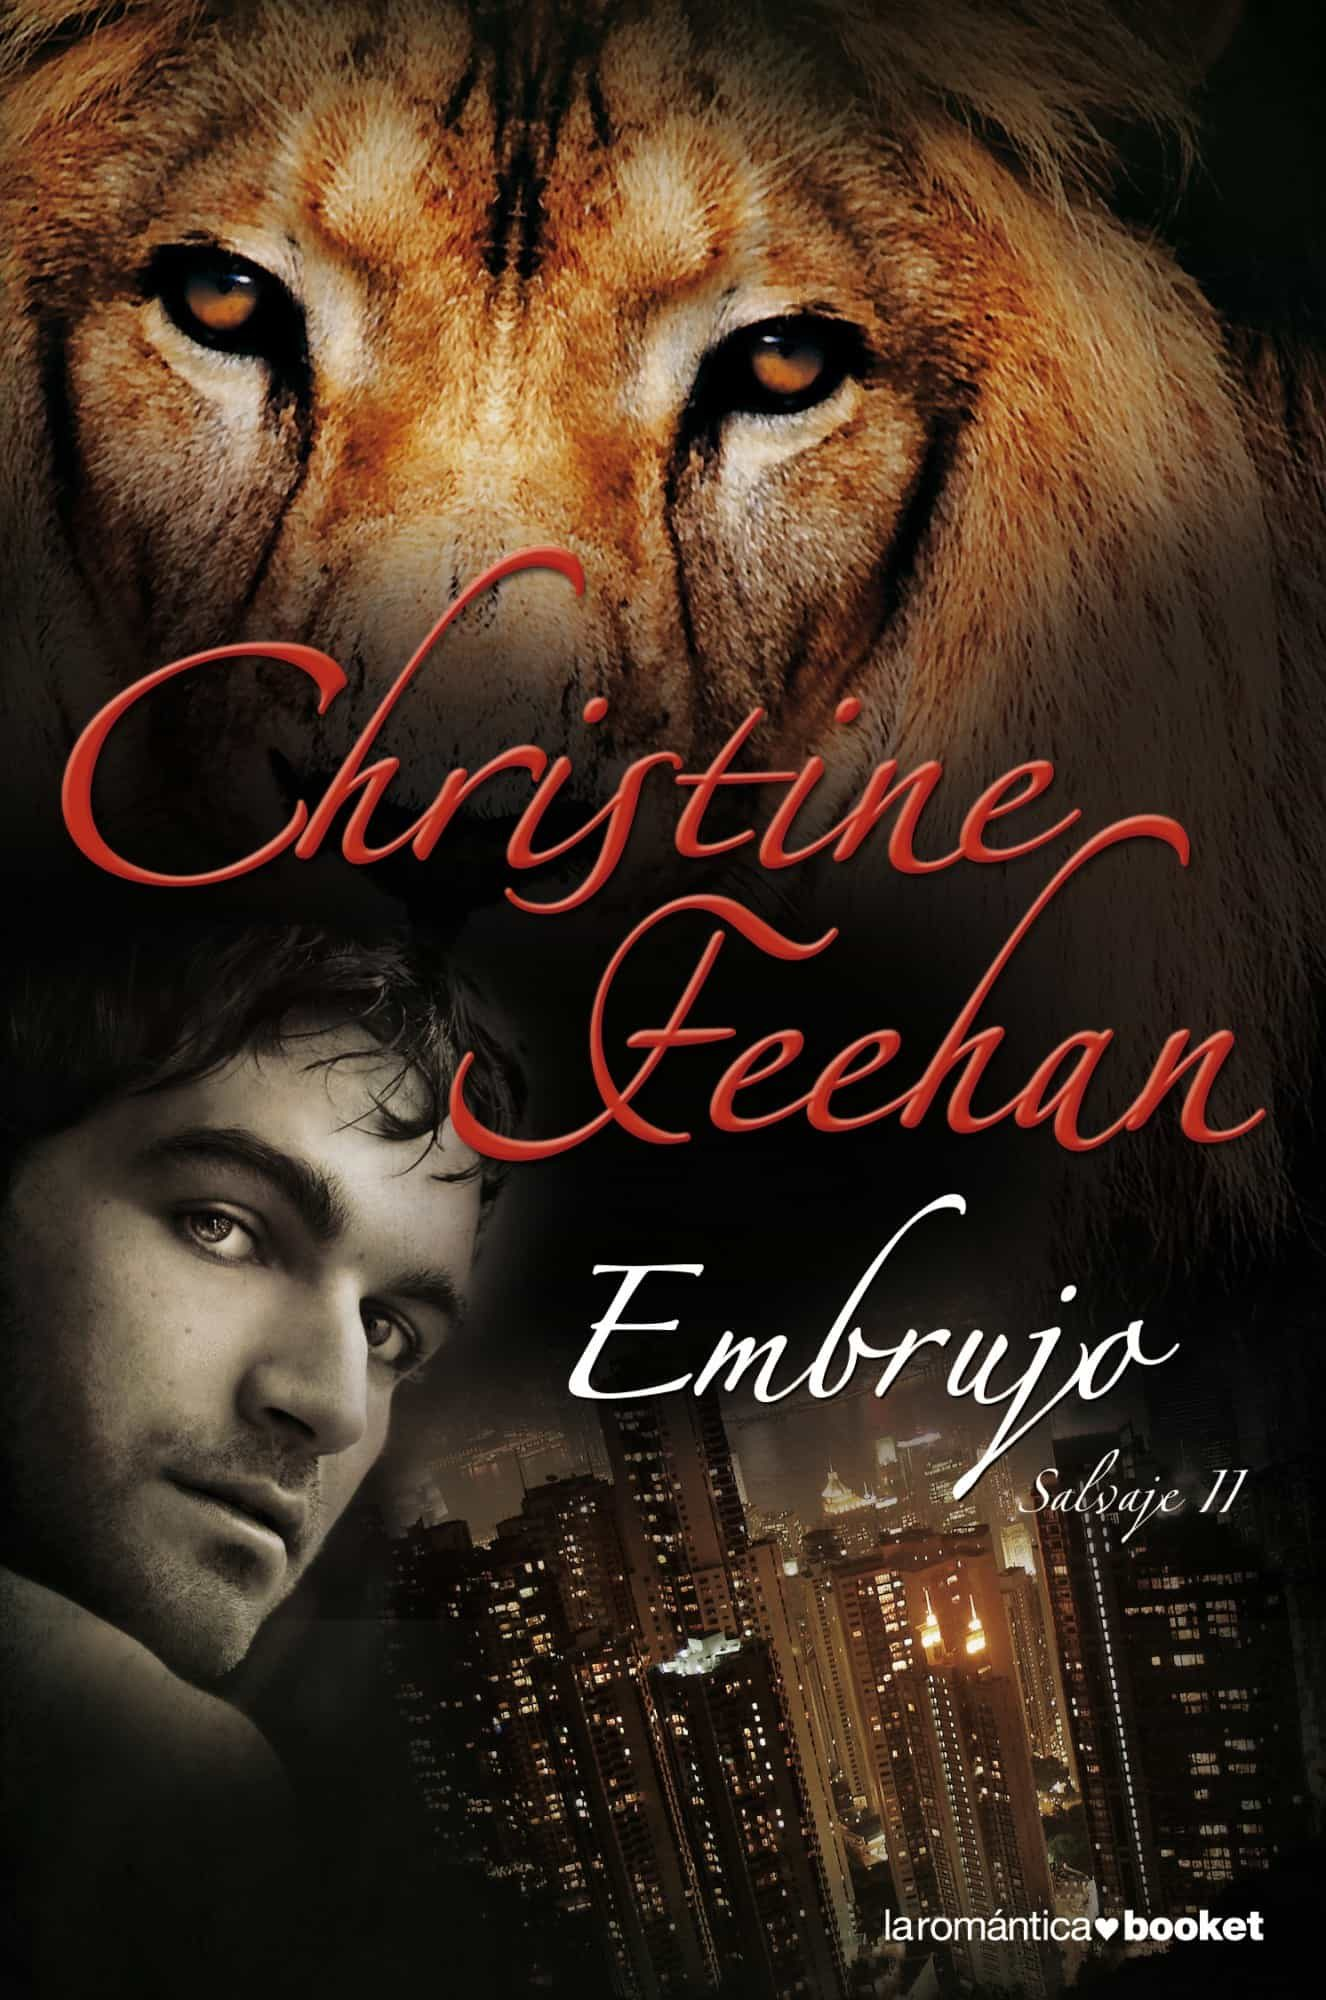 Christine Feehan - Peuple leopard 02 - Embrujo - Burning Wild Embrujo-salvaje-ii-9788408103011